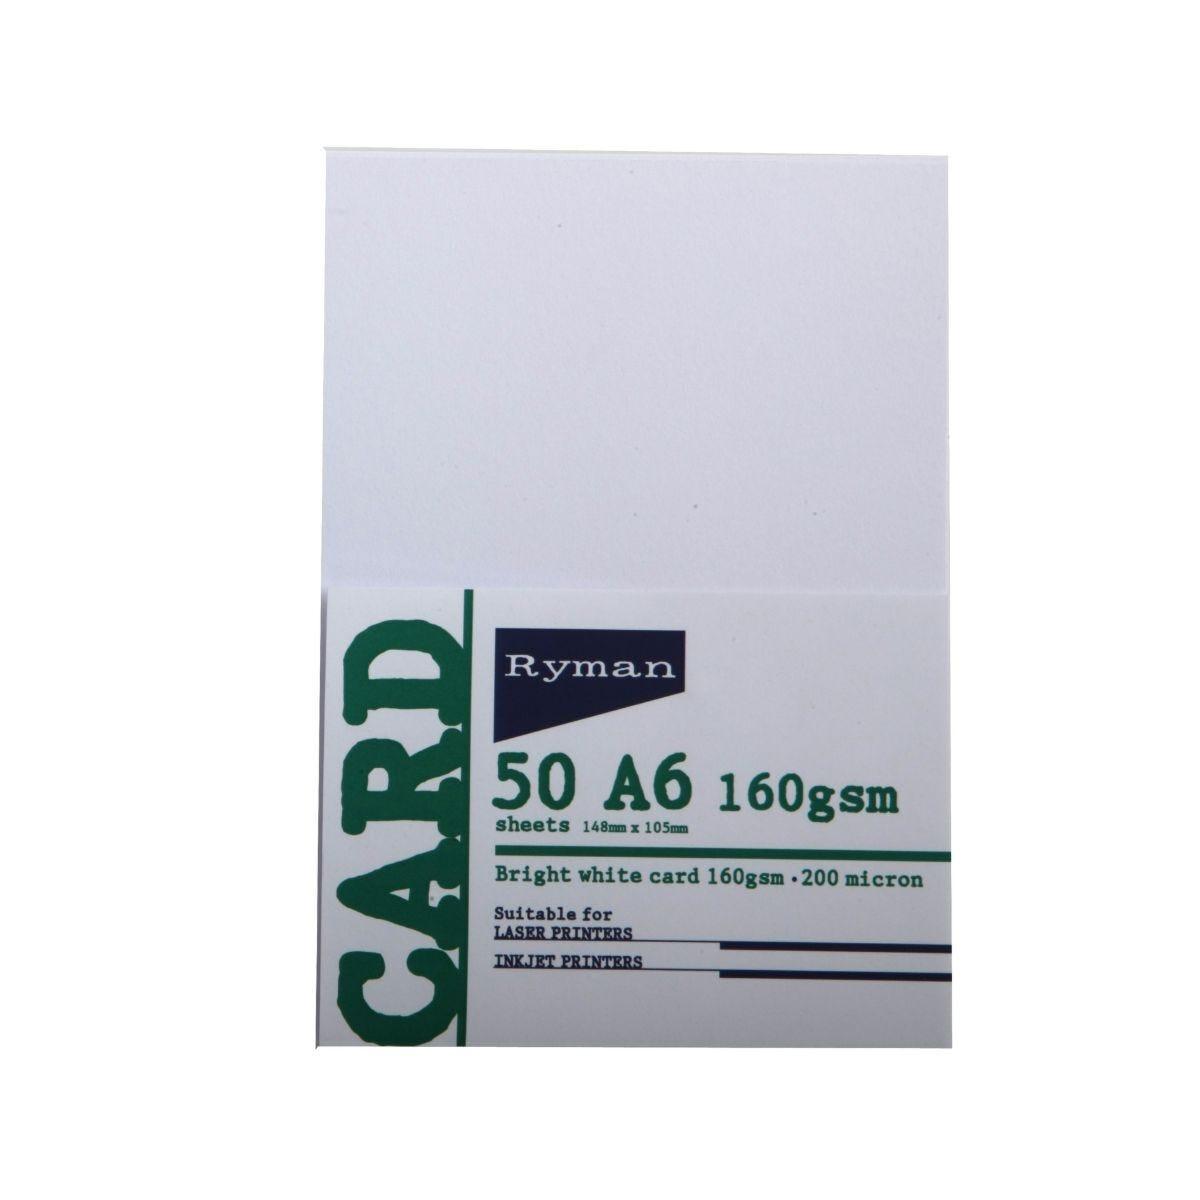 Ryman Card A6 160gsm 50 Sheets